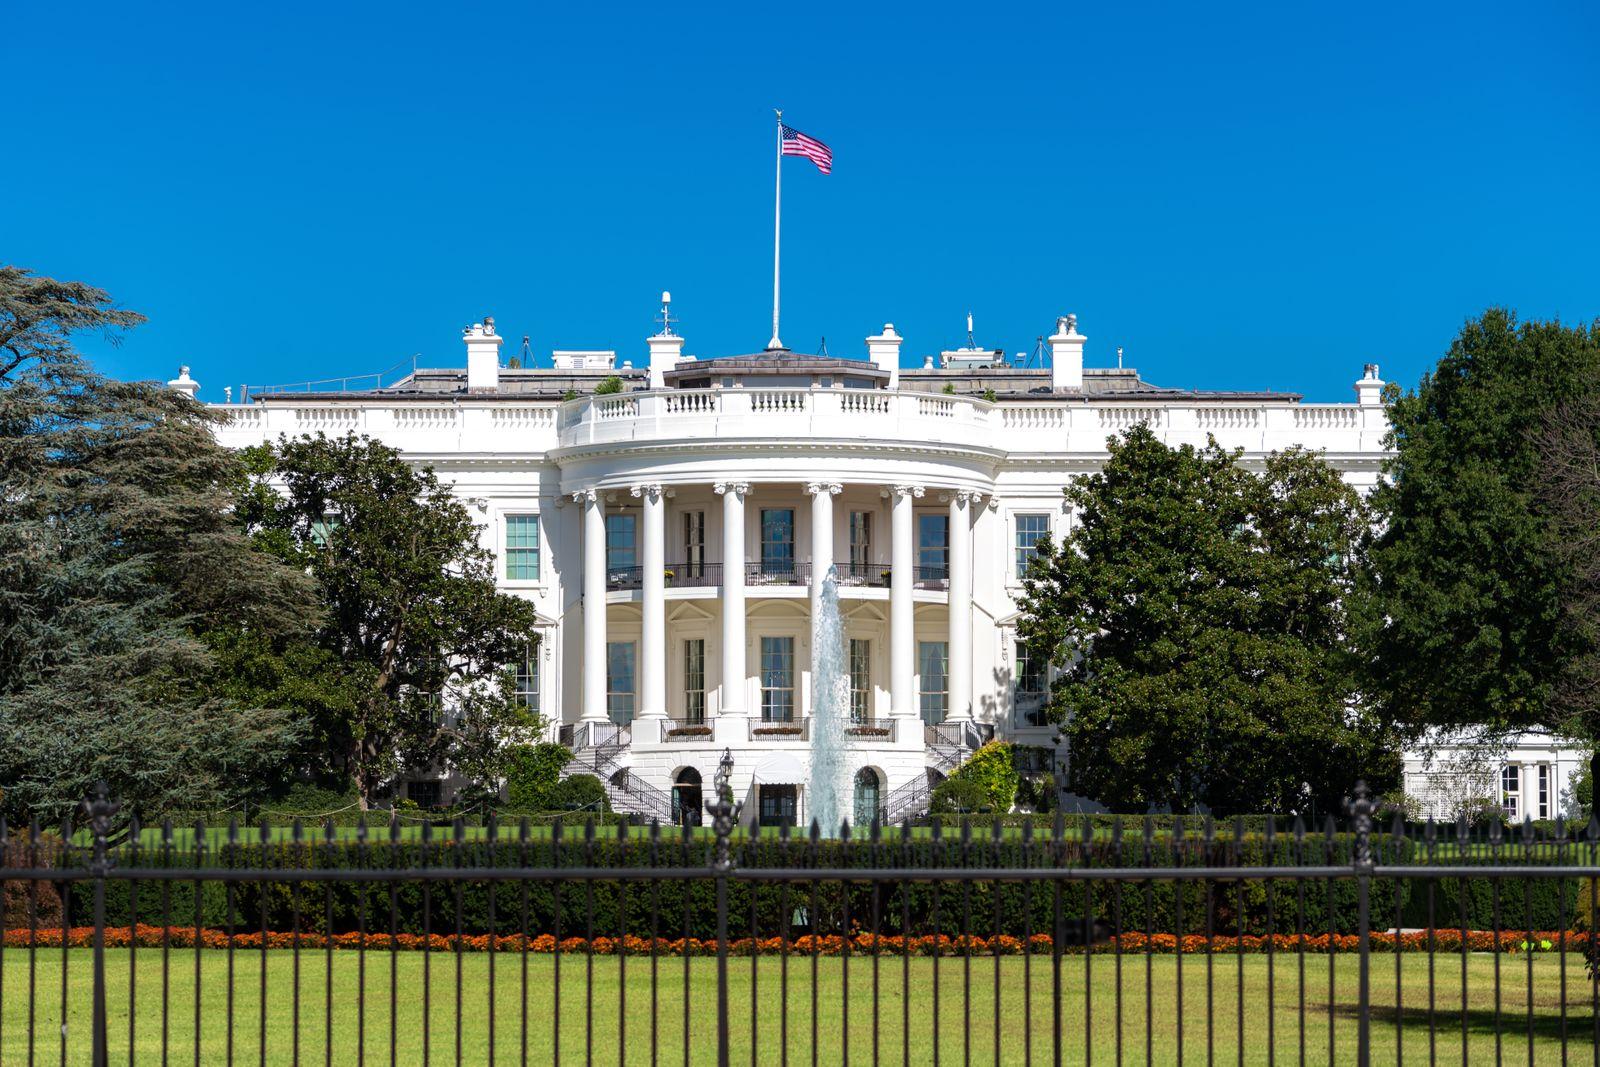 White House on deep blue sky background in Washington DC, USA.